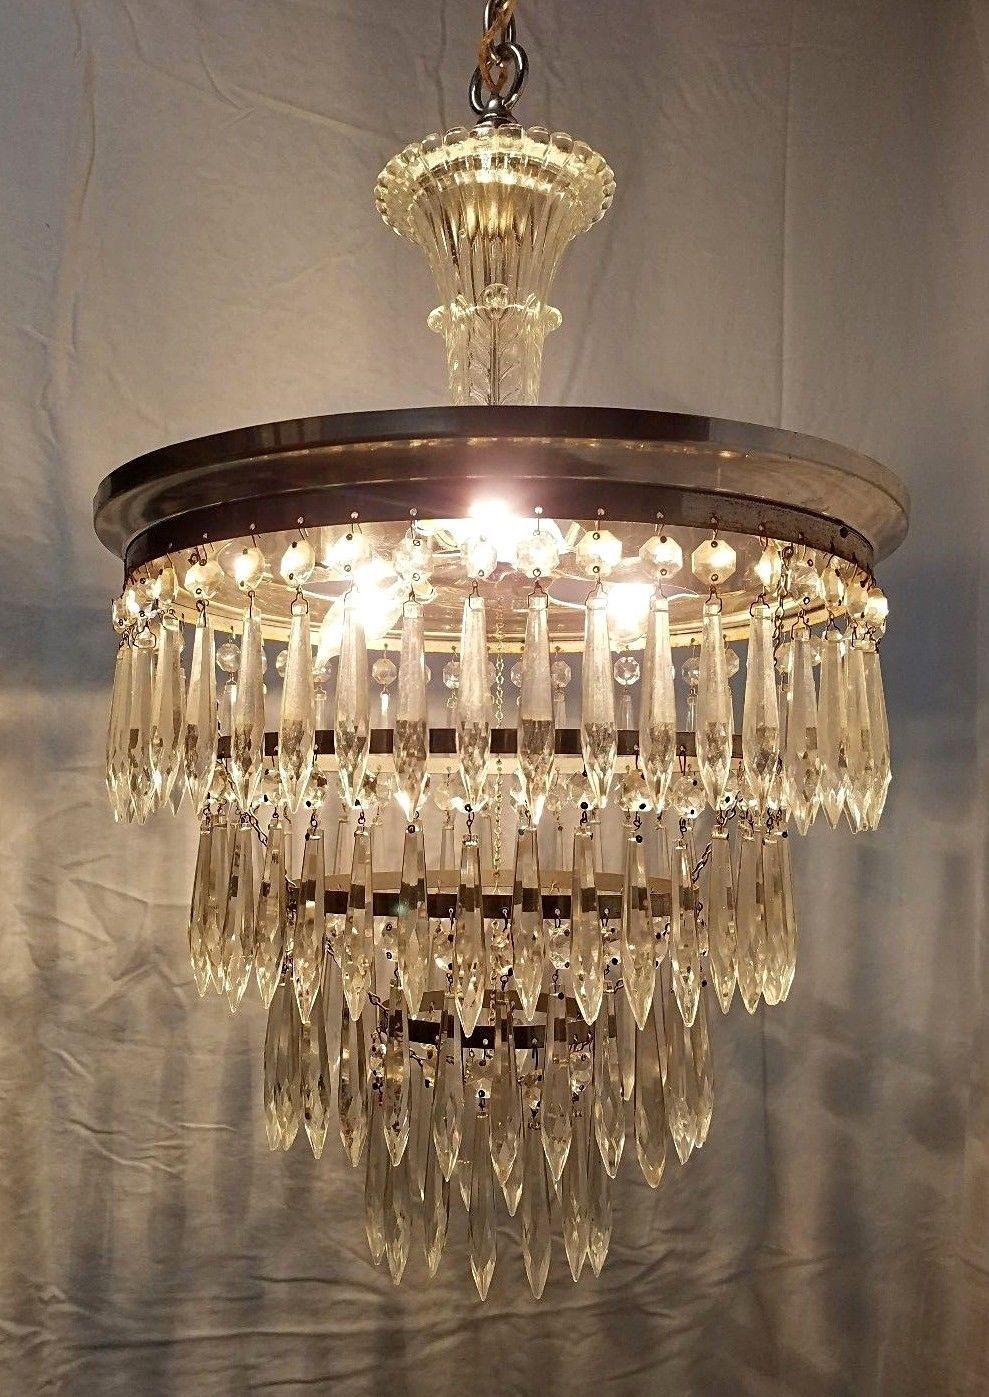 Vintage Wedding Cake 4 Tier Chandelier 131 Crystal Prisms Art Deco